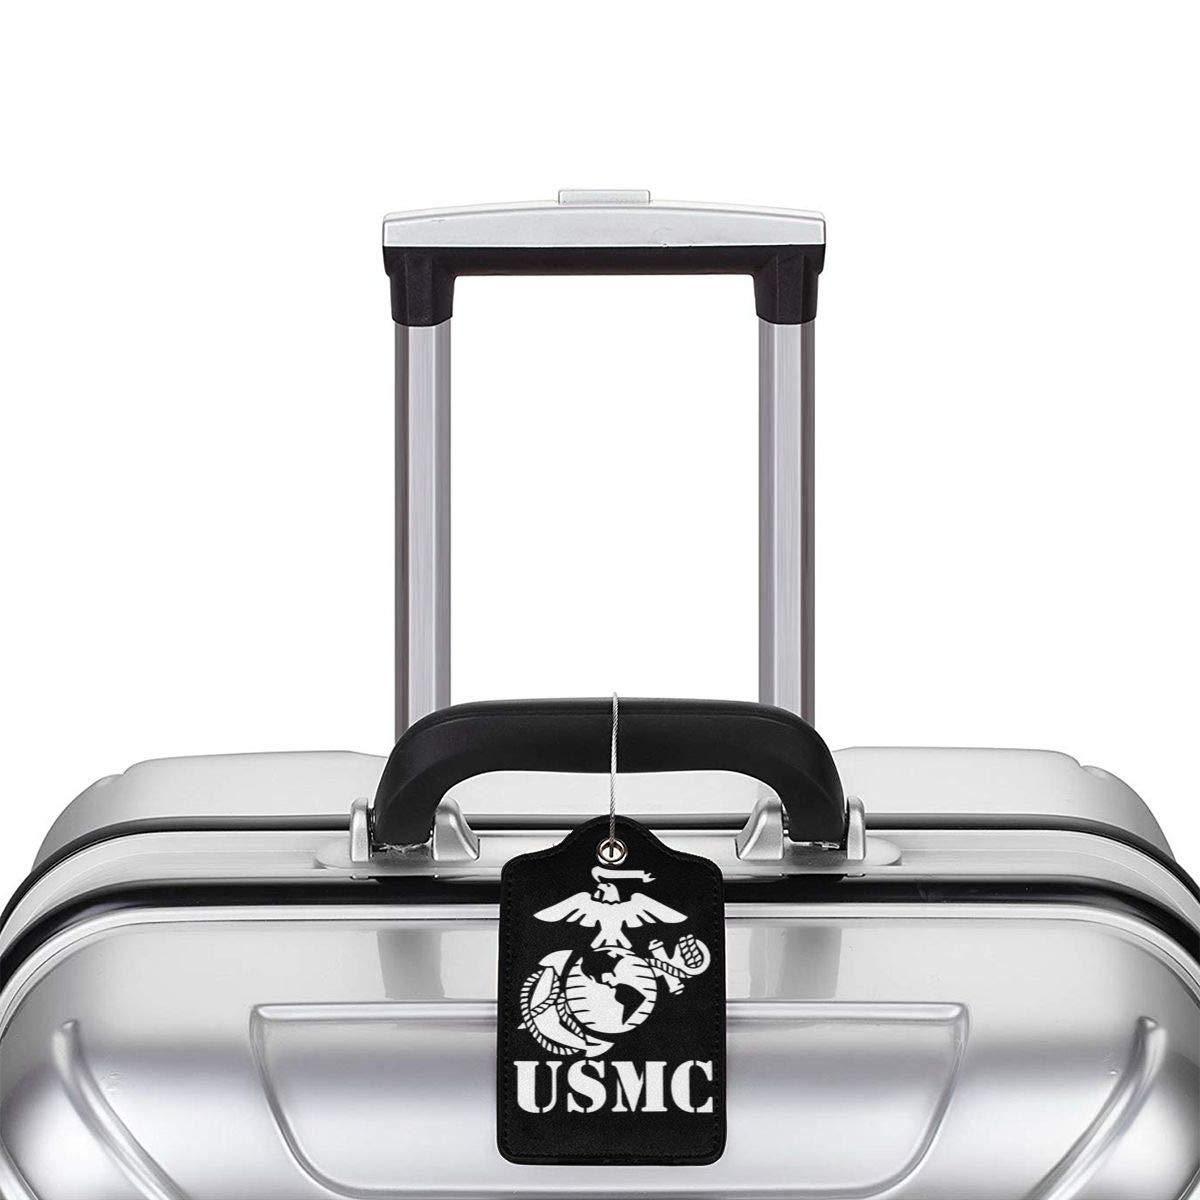 Globe Anchor USMC Marine Corps Viny Leather Luggage Tag Travel ID Label For Baggage Suitcase